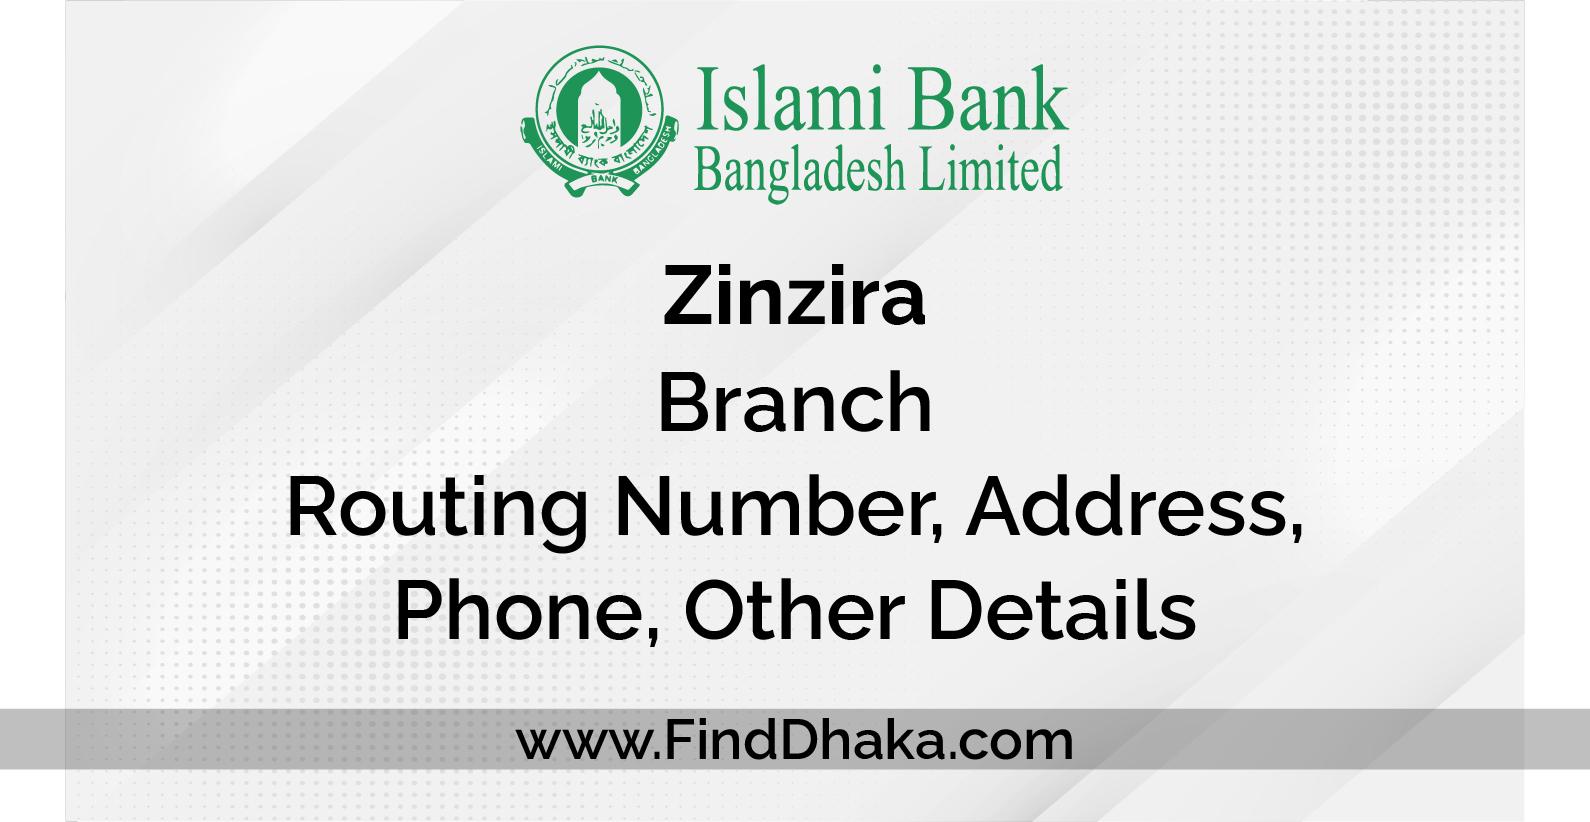 Photo of Islami Bank Zinzira Branch